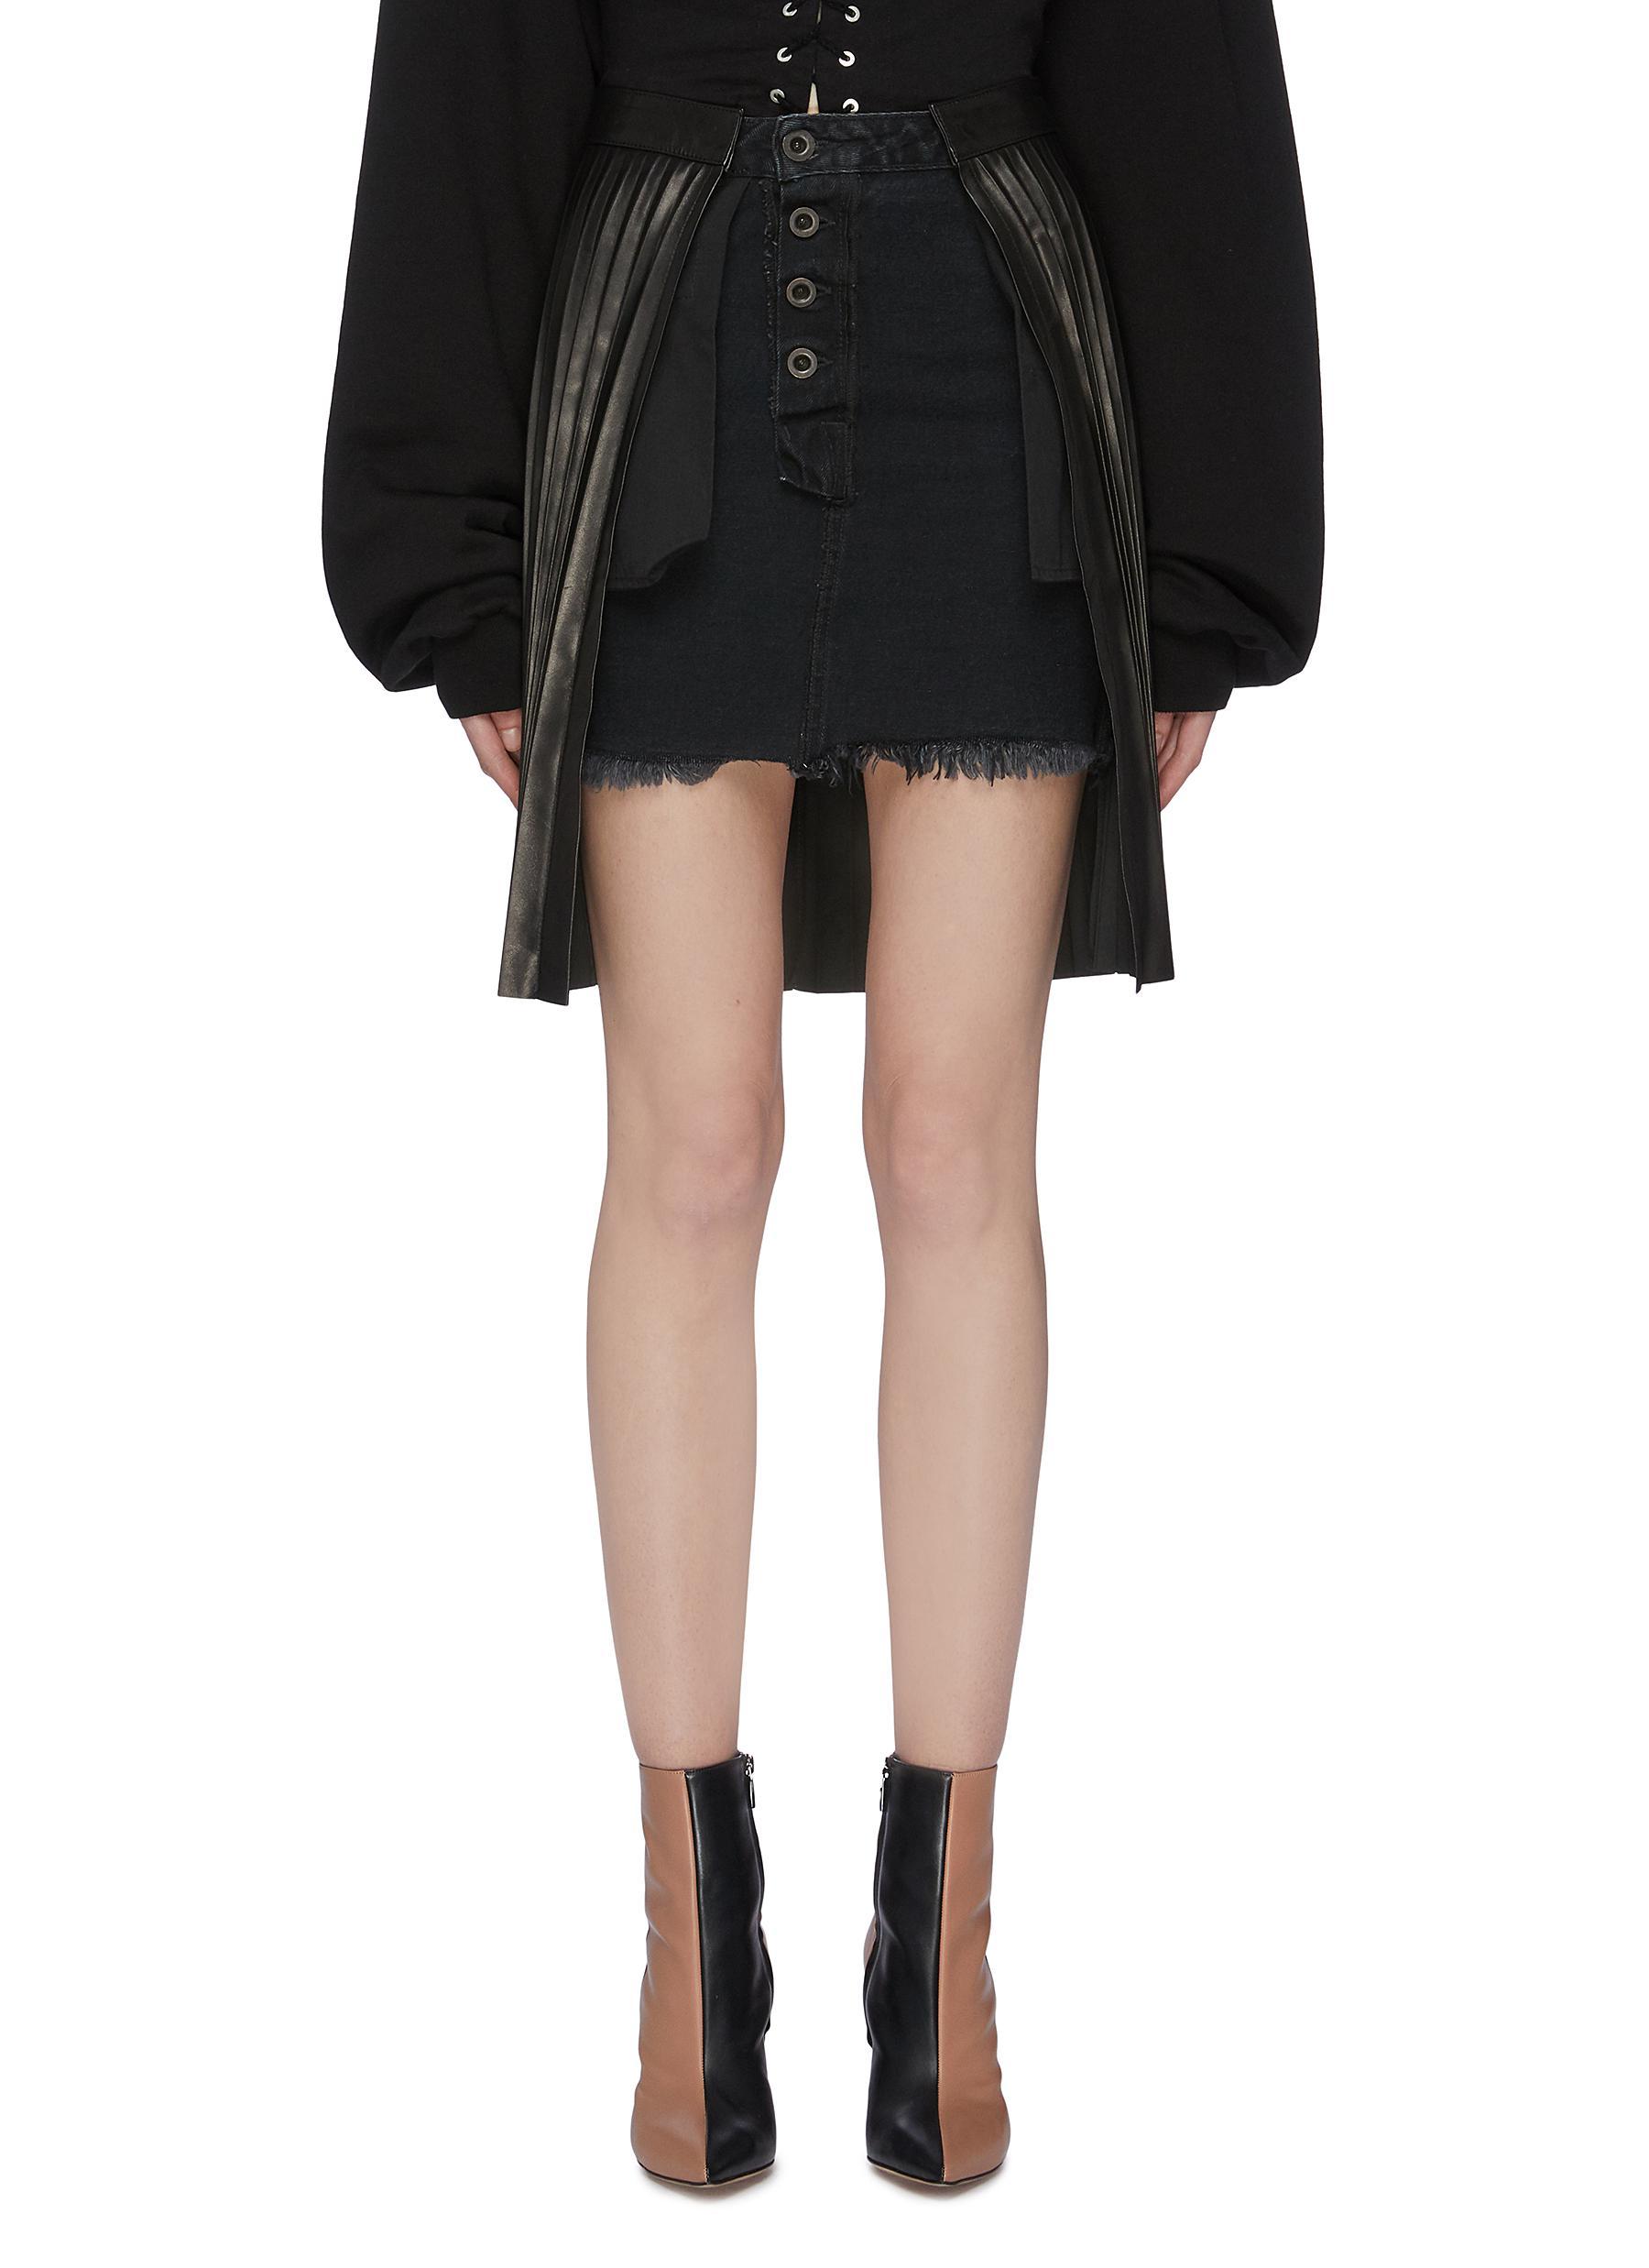 81492b8882be Ben Taverniti Unravel Project. Pleated leather overlay panel denim skirt